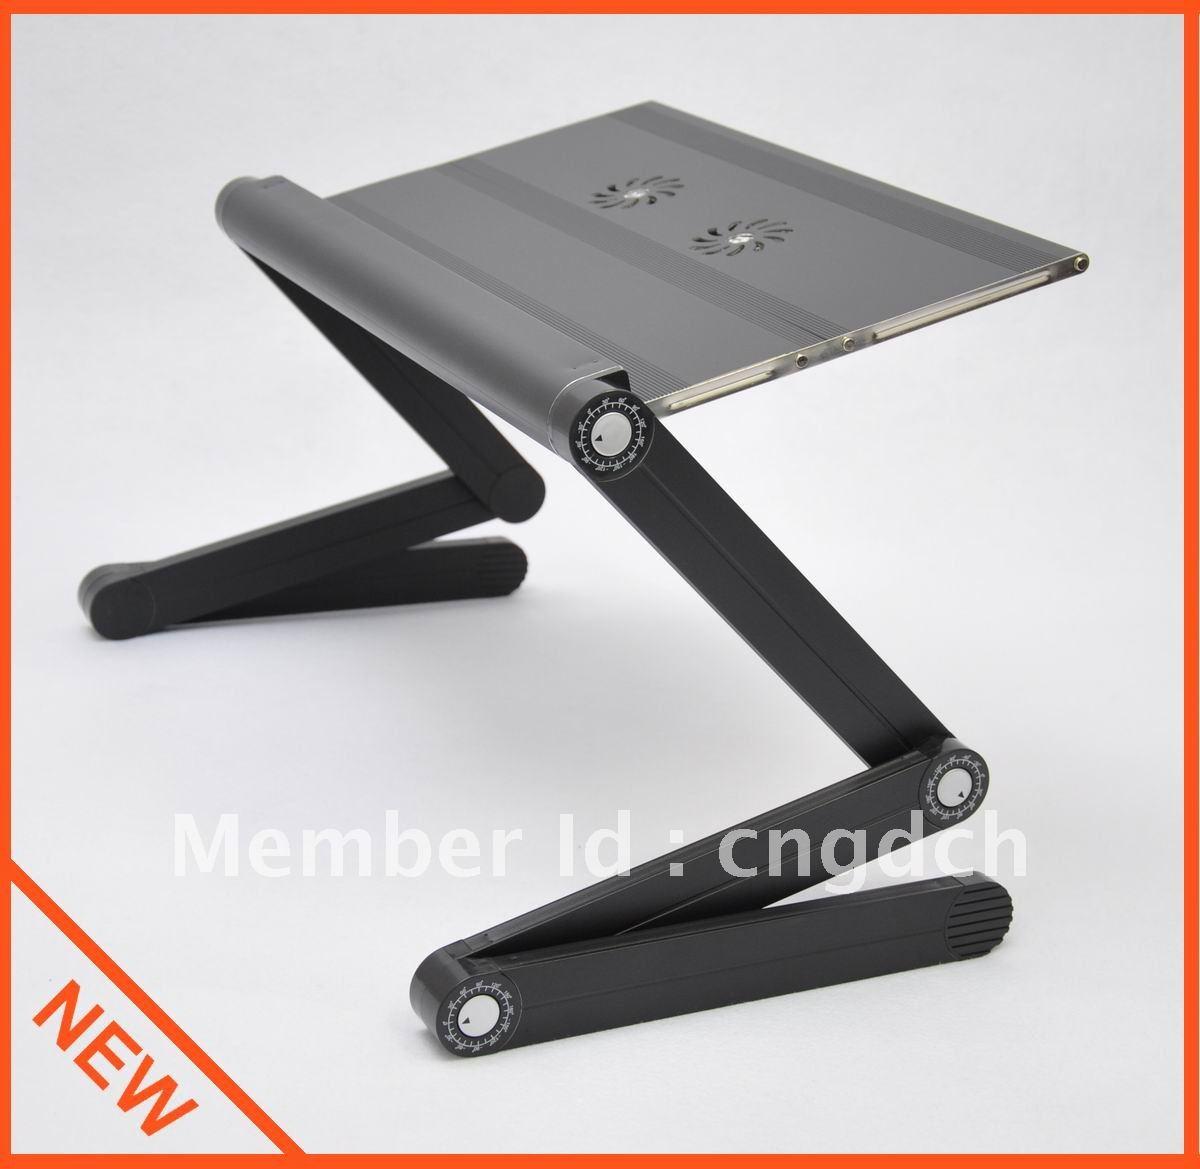 Buy Computer Stand Notebood Bed Desk Computer Desk Bed